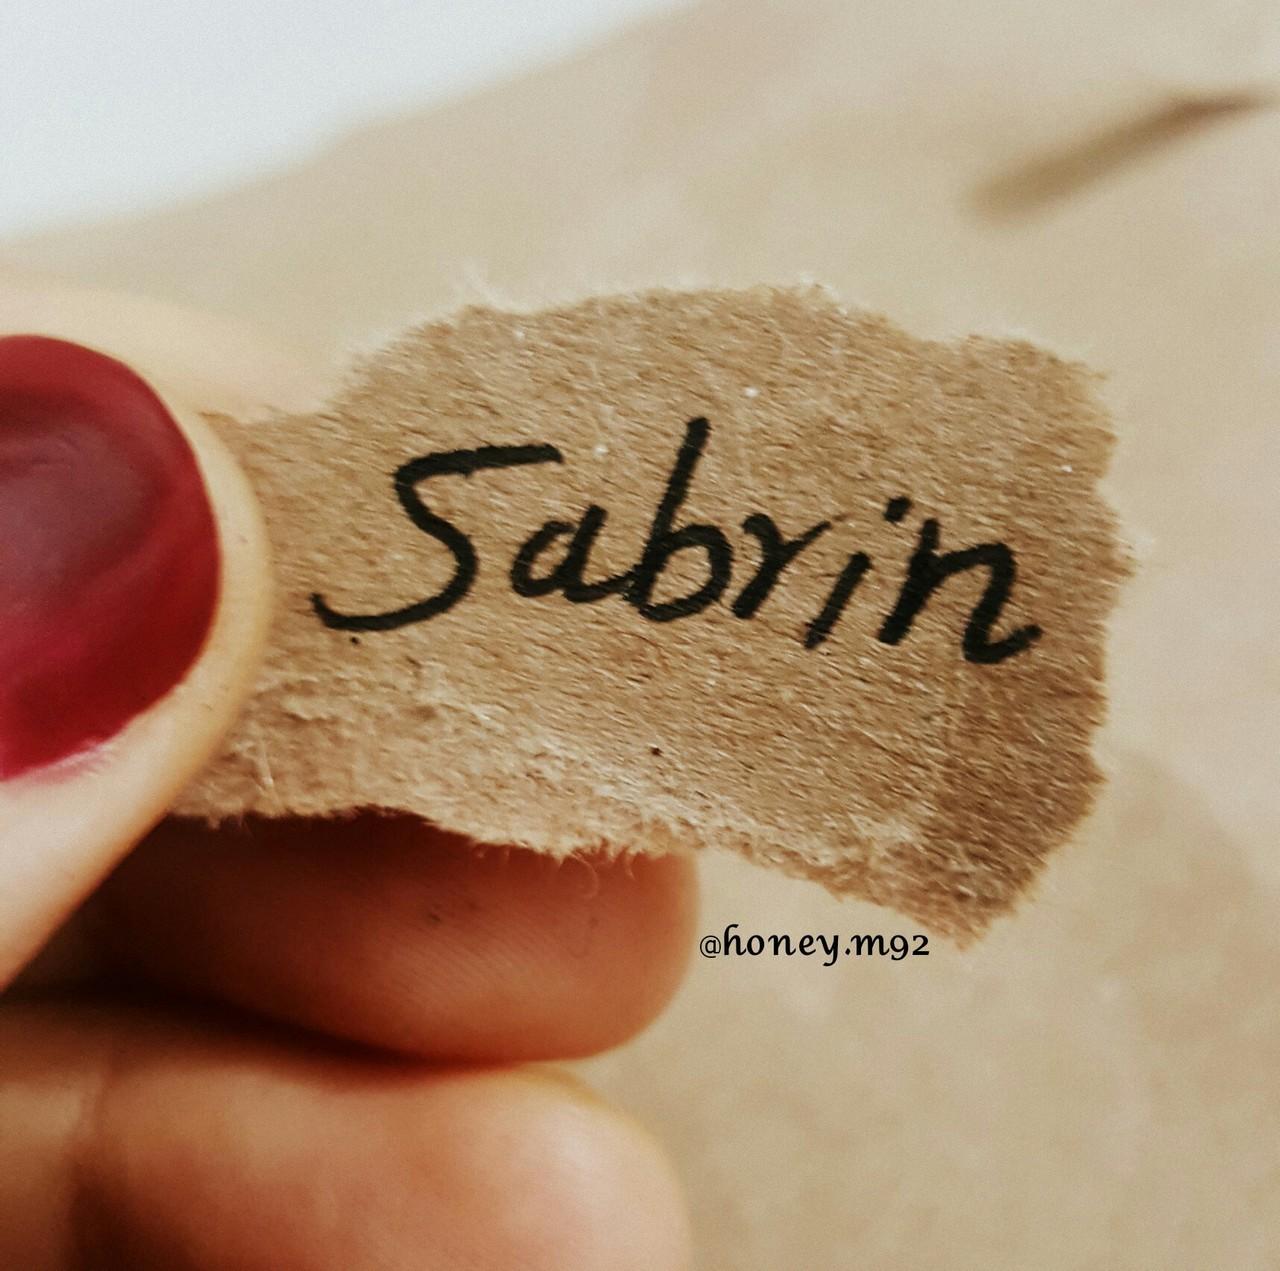 صور اسم صابرين معنى إسم صابرين صفات أسم صابرين